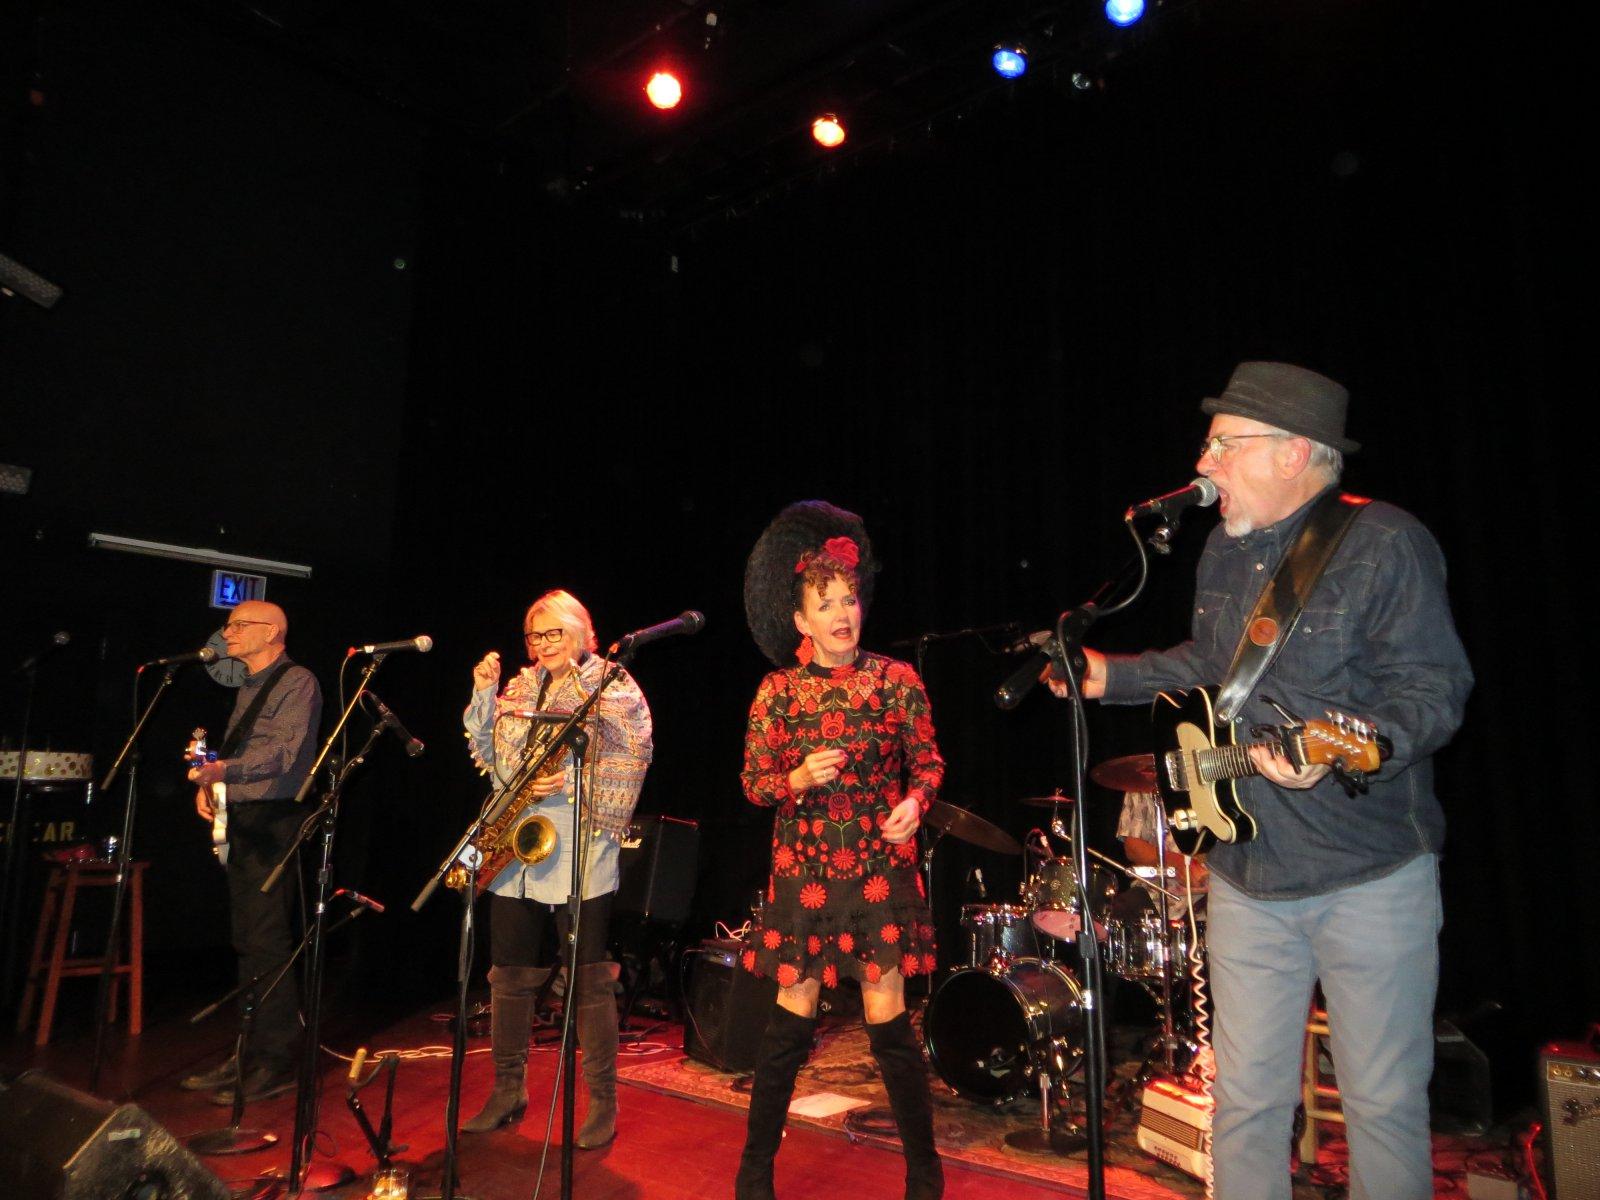 Mike Sieger, Juli Wood, Robin Pluer and John Sieger